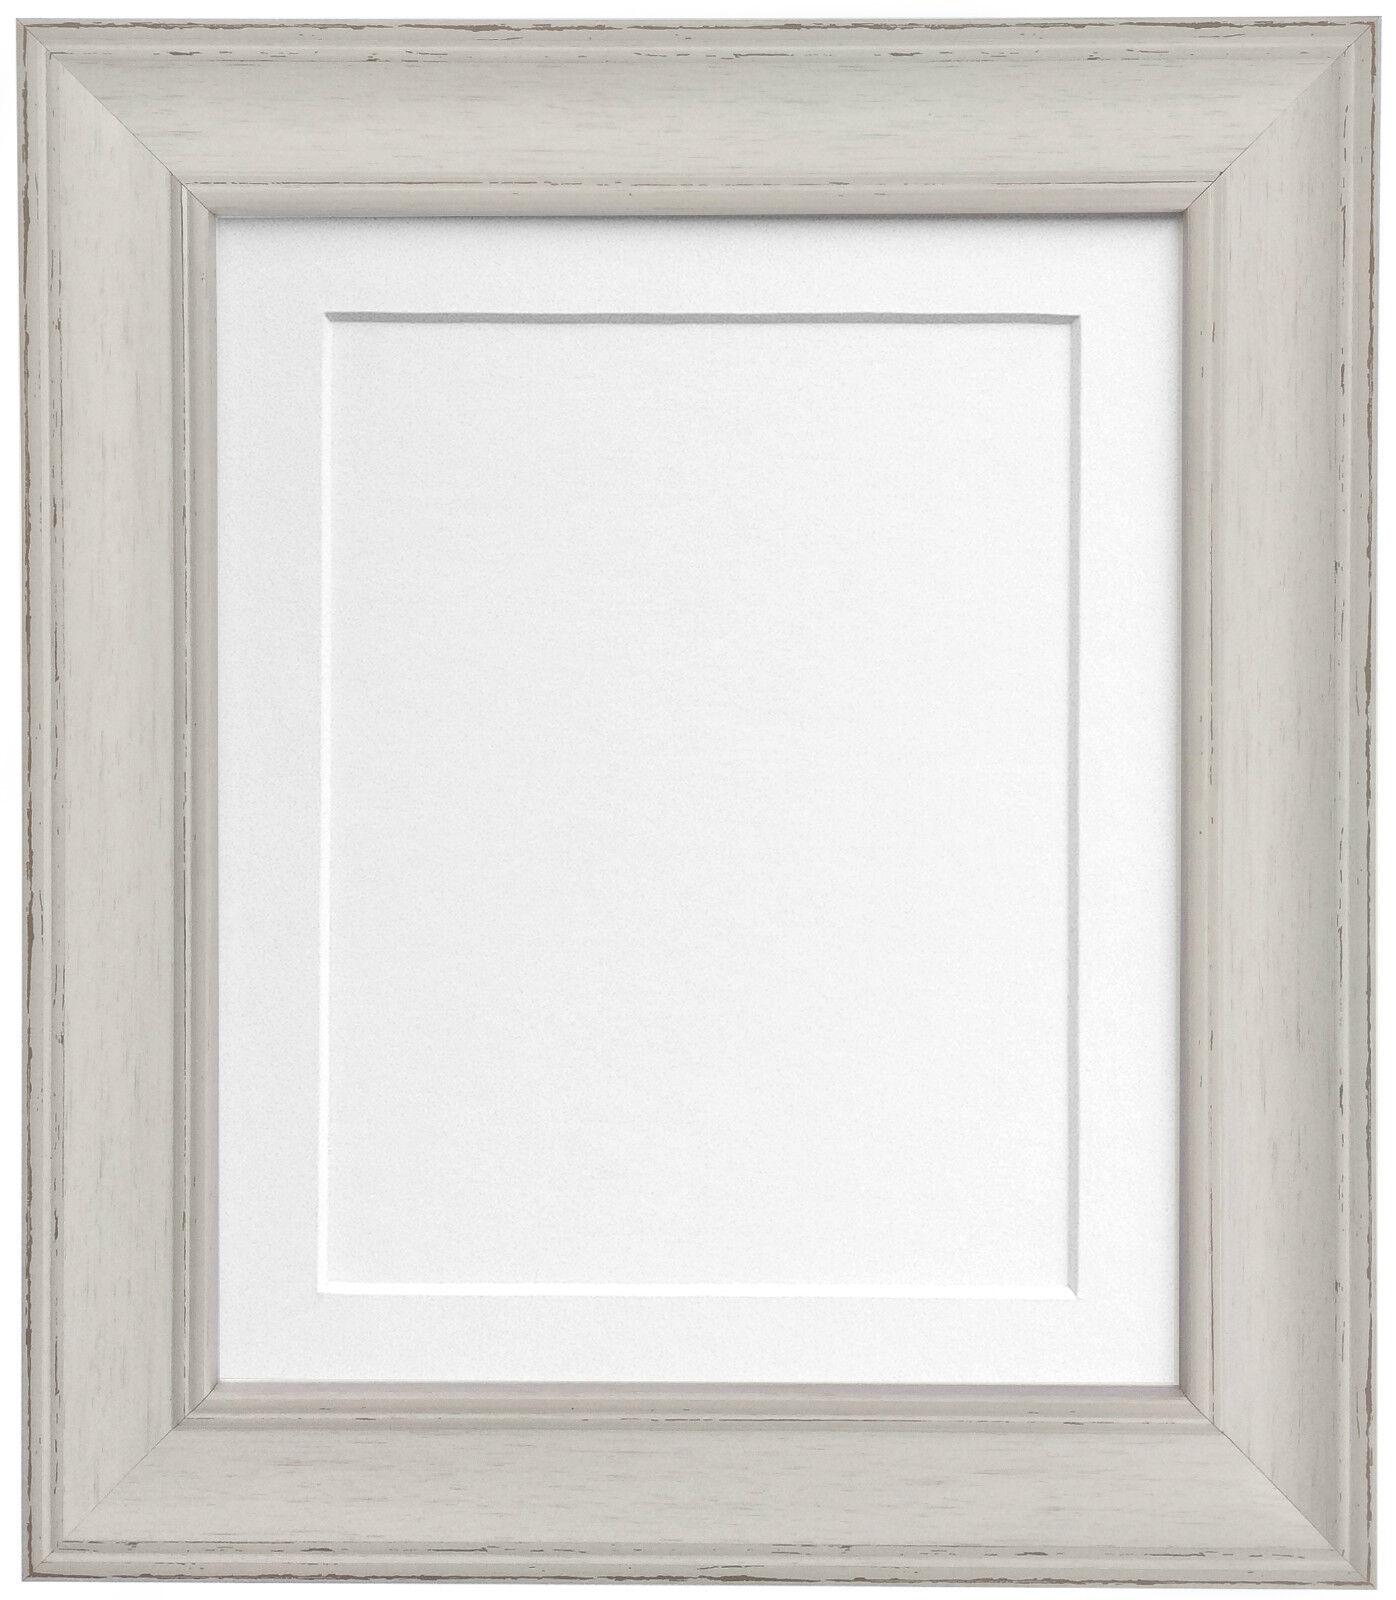 Scandi Vintage Distressed Pale Grey Photo Picture frames & mount ...